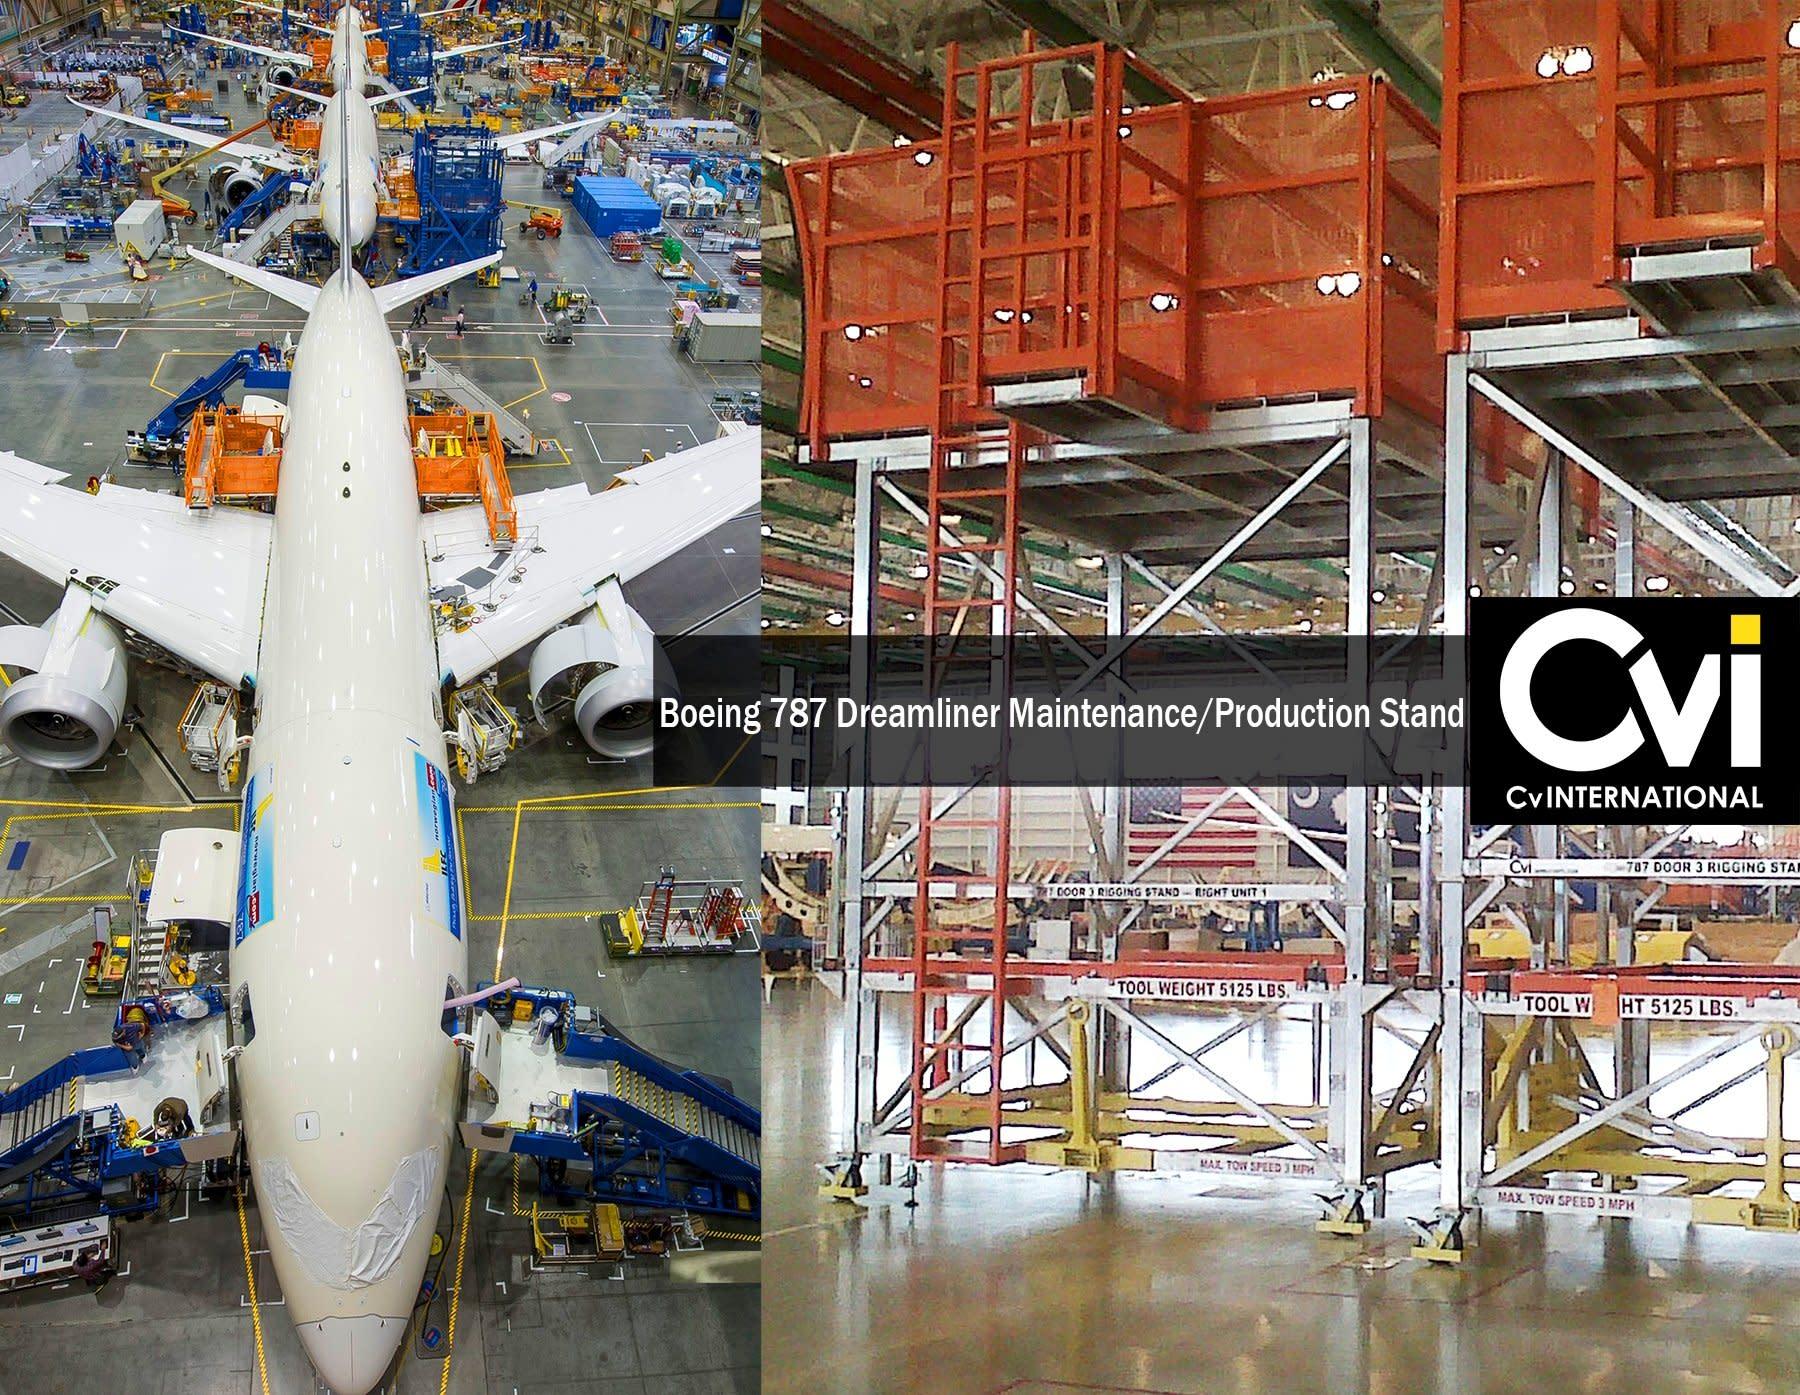 cv international releases boeing 787 dreamliner maintenance  production stand to charleston  sc